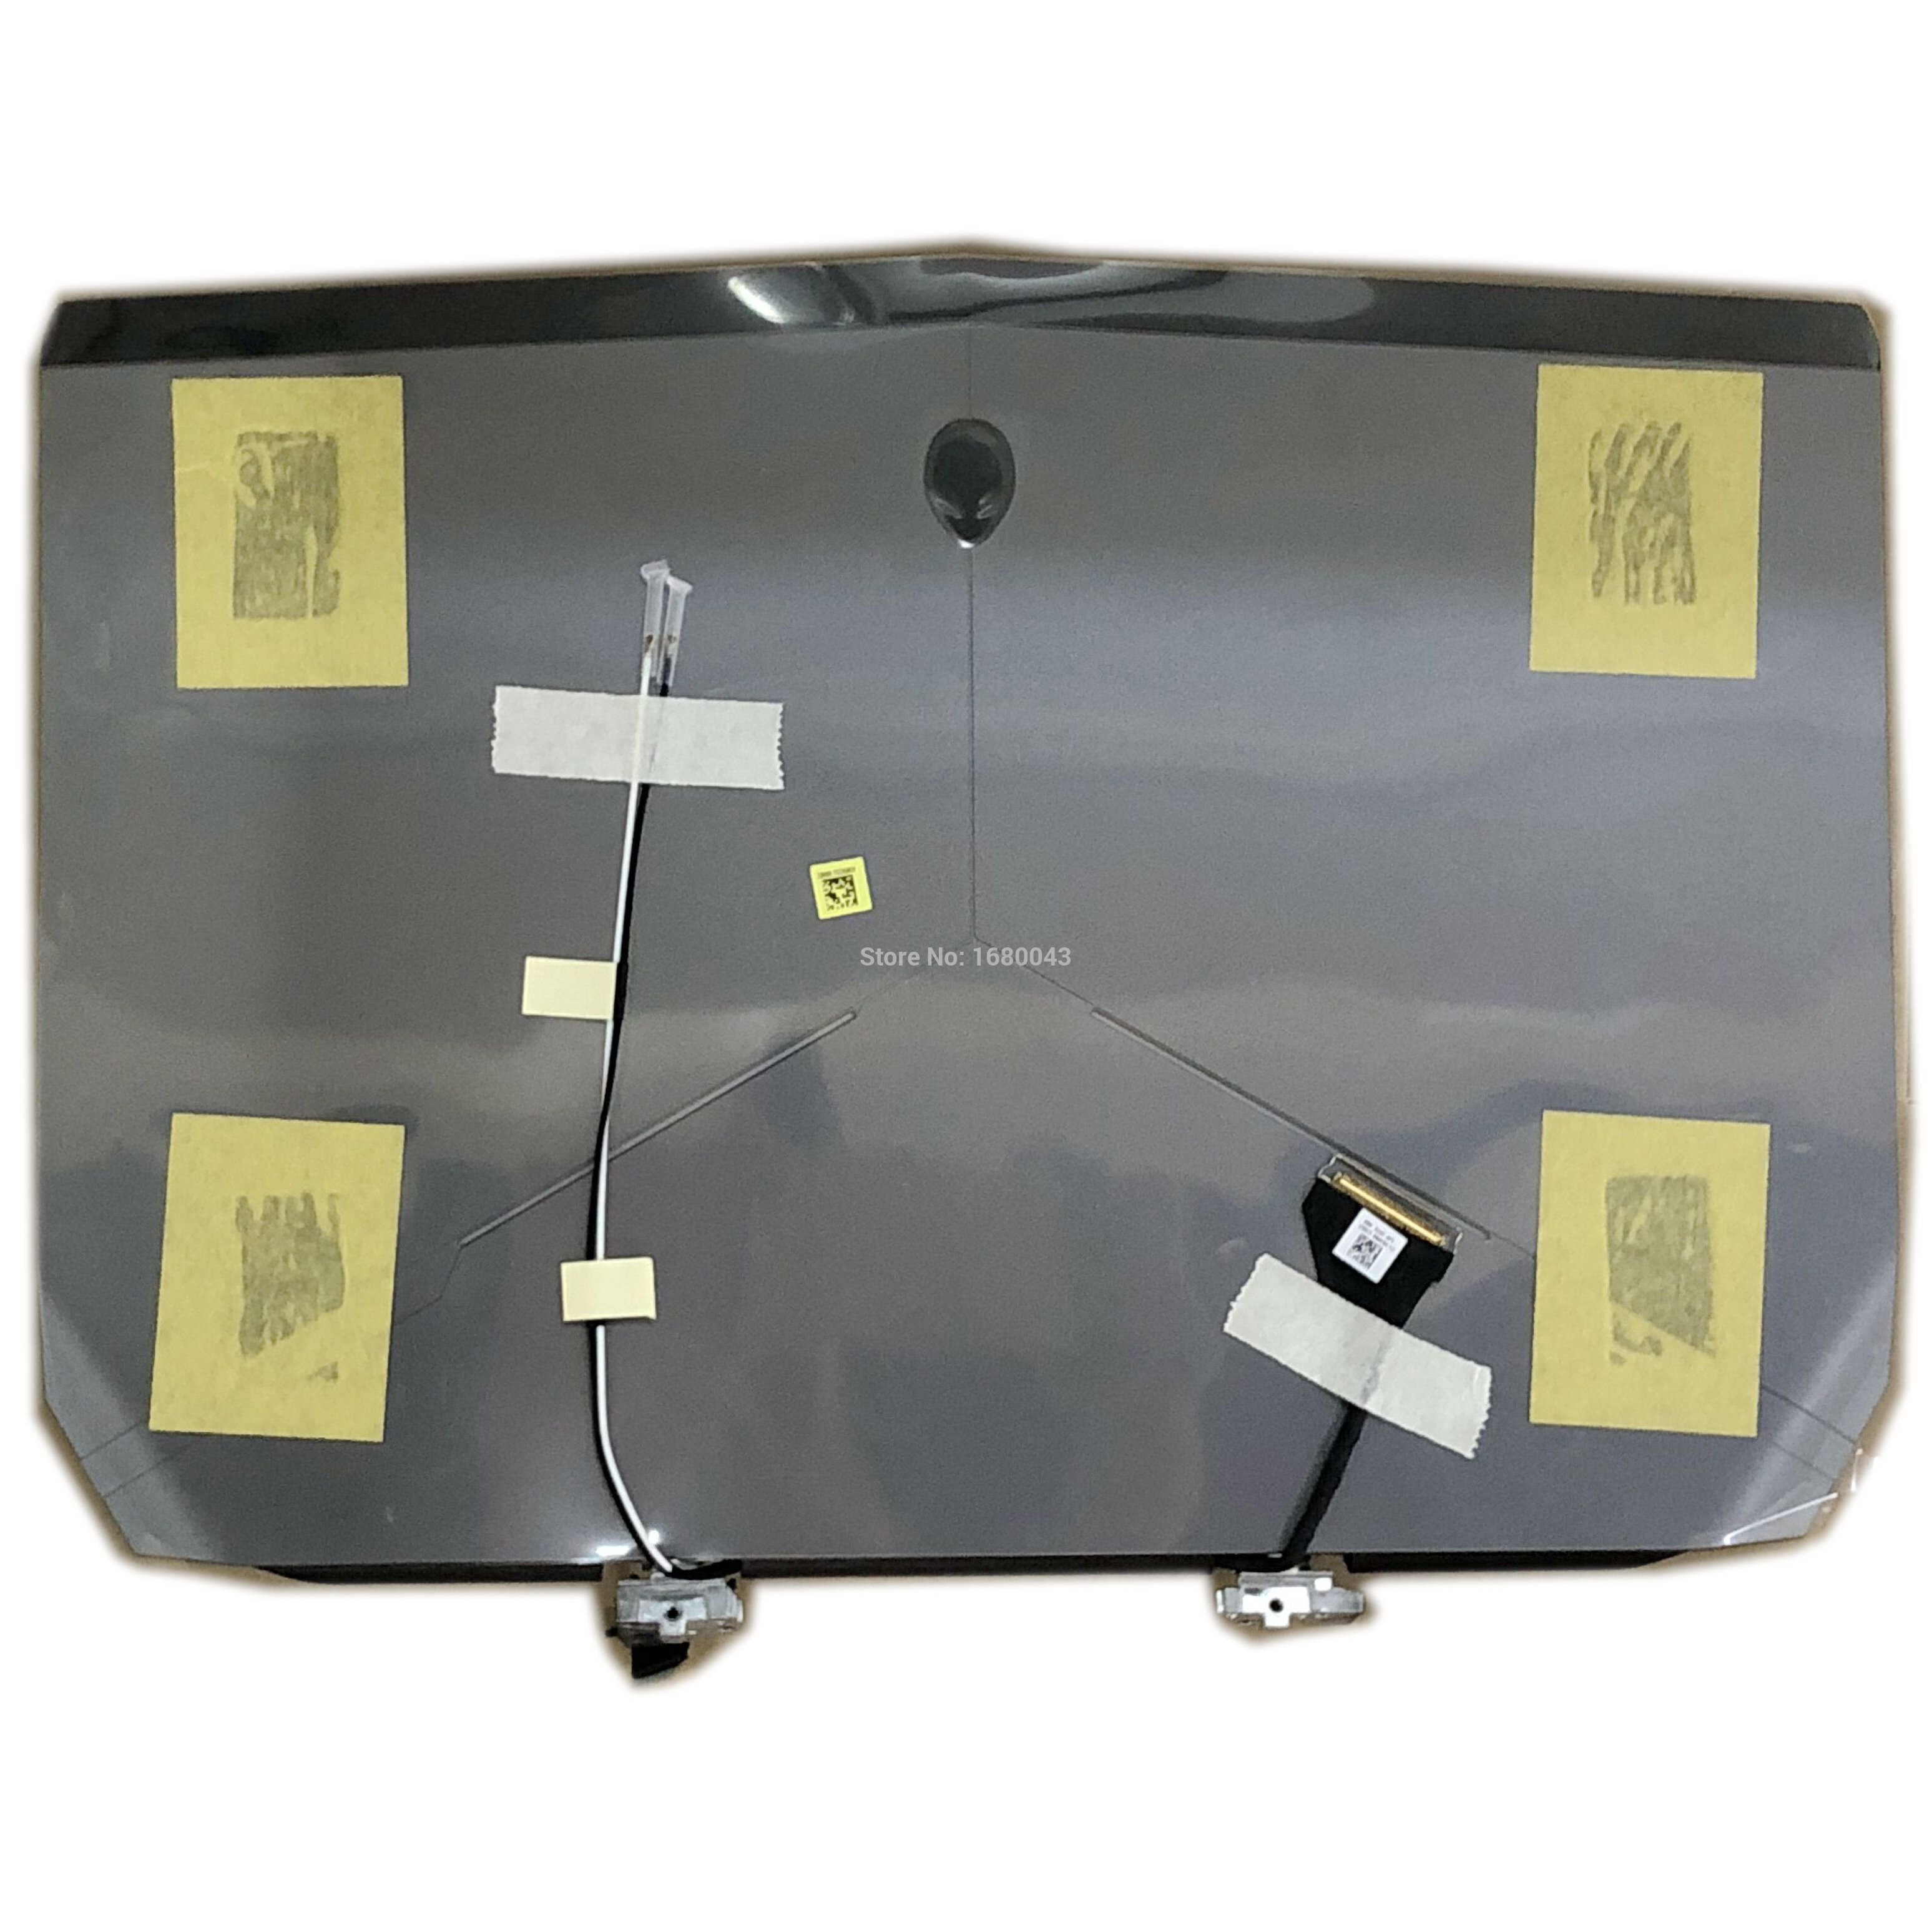 ЖК-дисплей LQ133T1JW20, светодиодная лампа, замена, полная верхняя половина, запасная часть для Dell Alienware 13 R2 R1